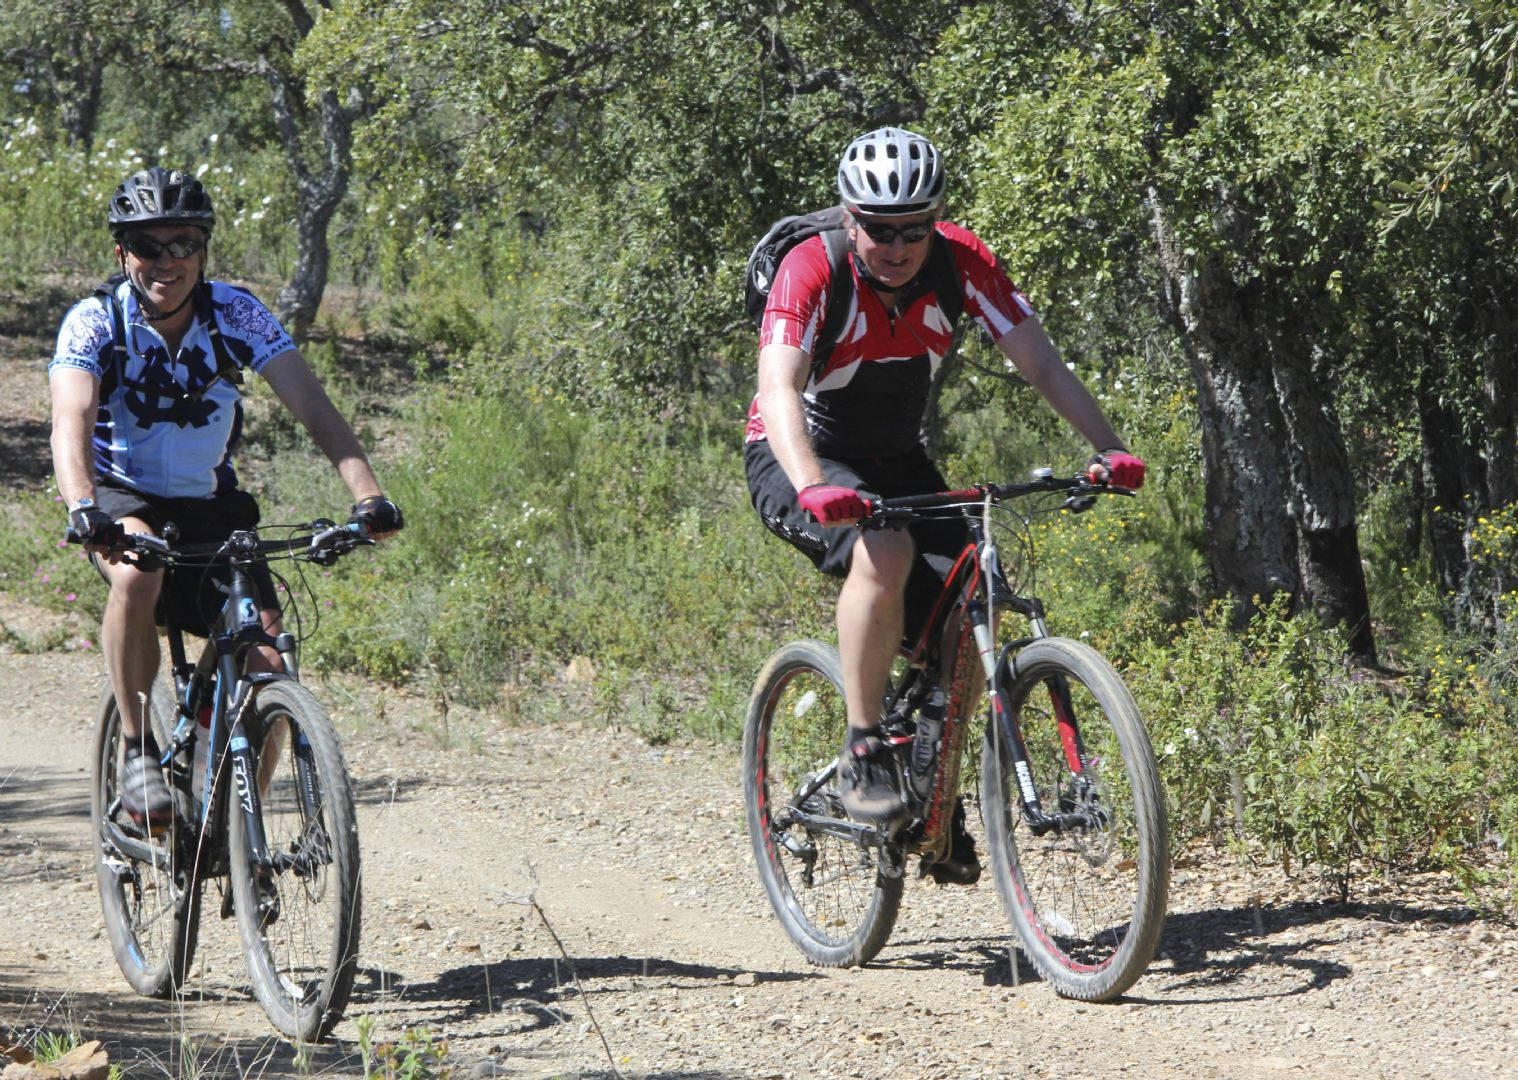 mountainbikingspain2.jpg - Spain - Ruta de la Plata - Guided Mountain Bike Holiday - Mountain Biking